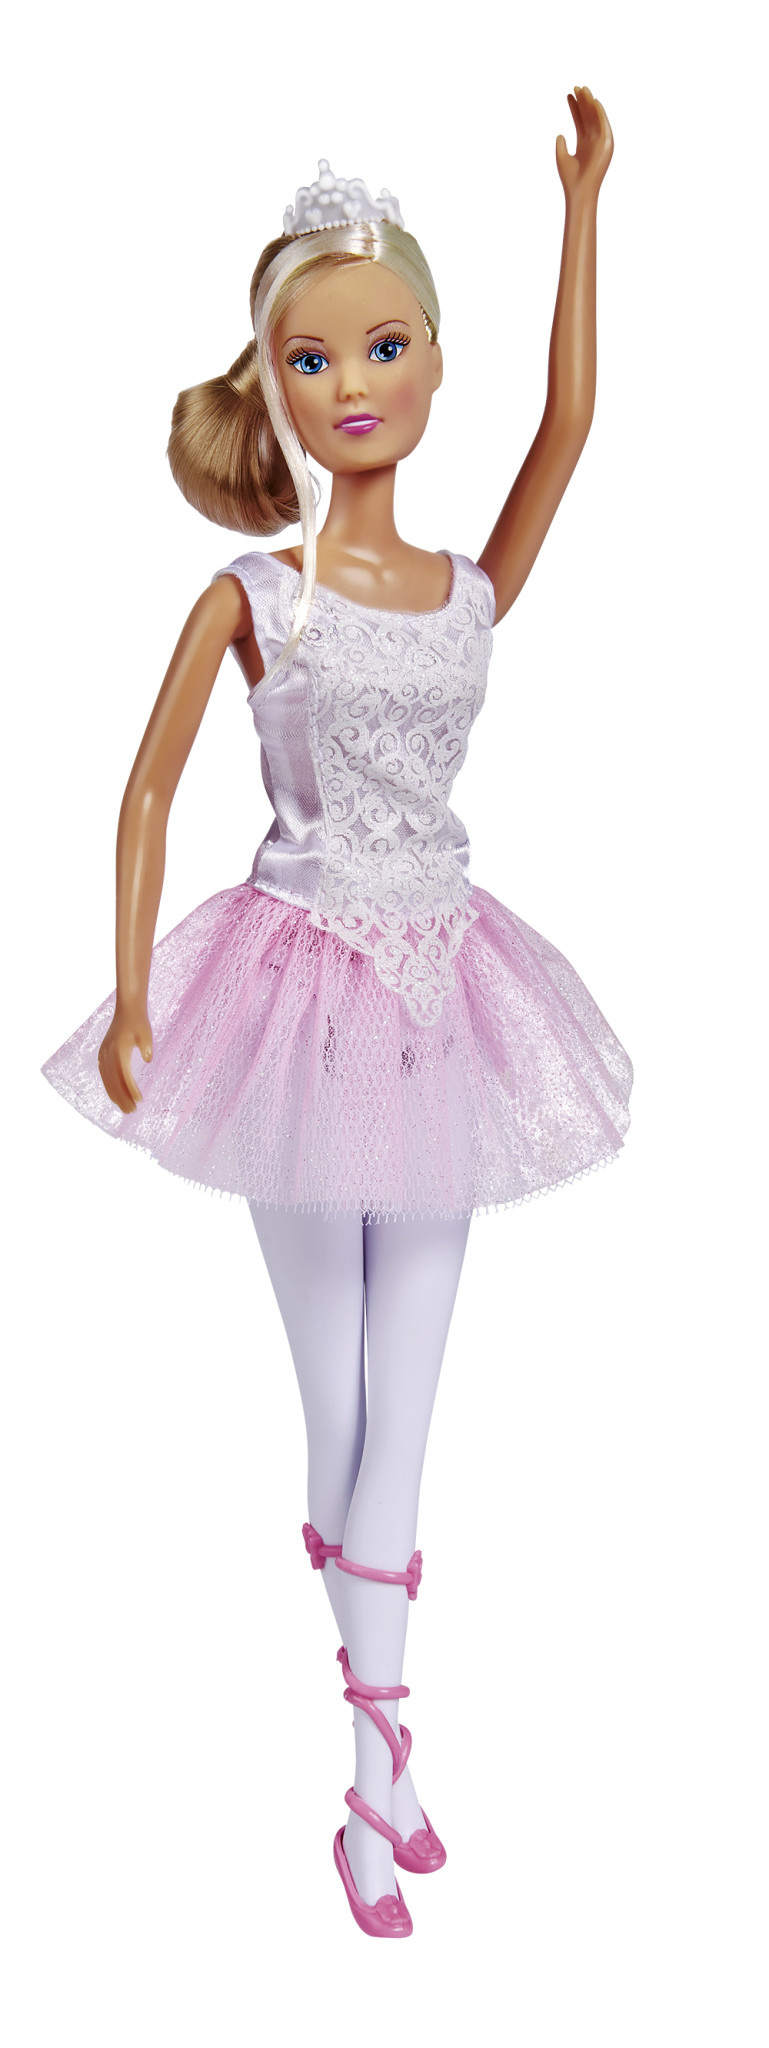 "Steffi Love Poupée ""Barbie - Steffi Love Ballerine''"